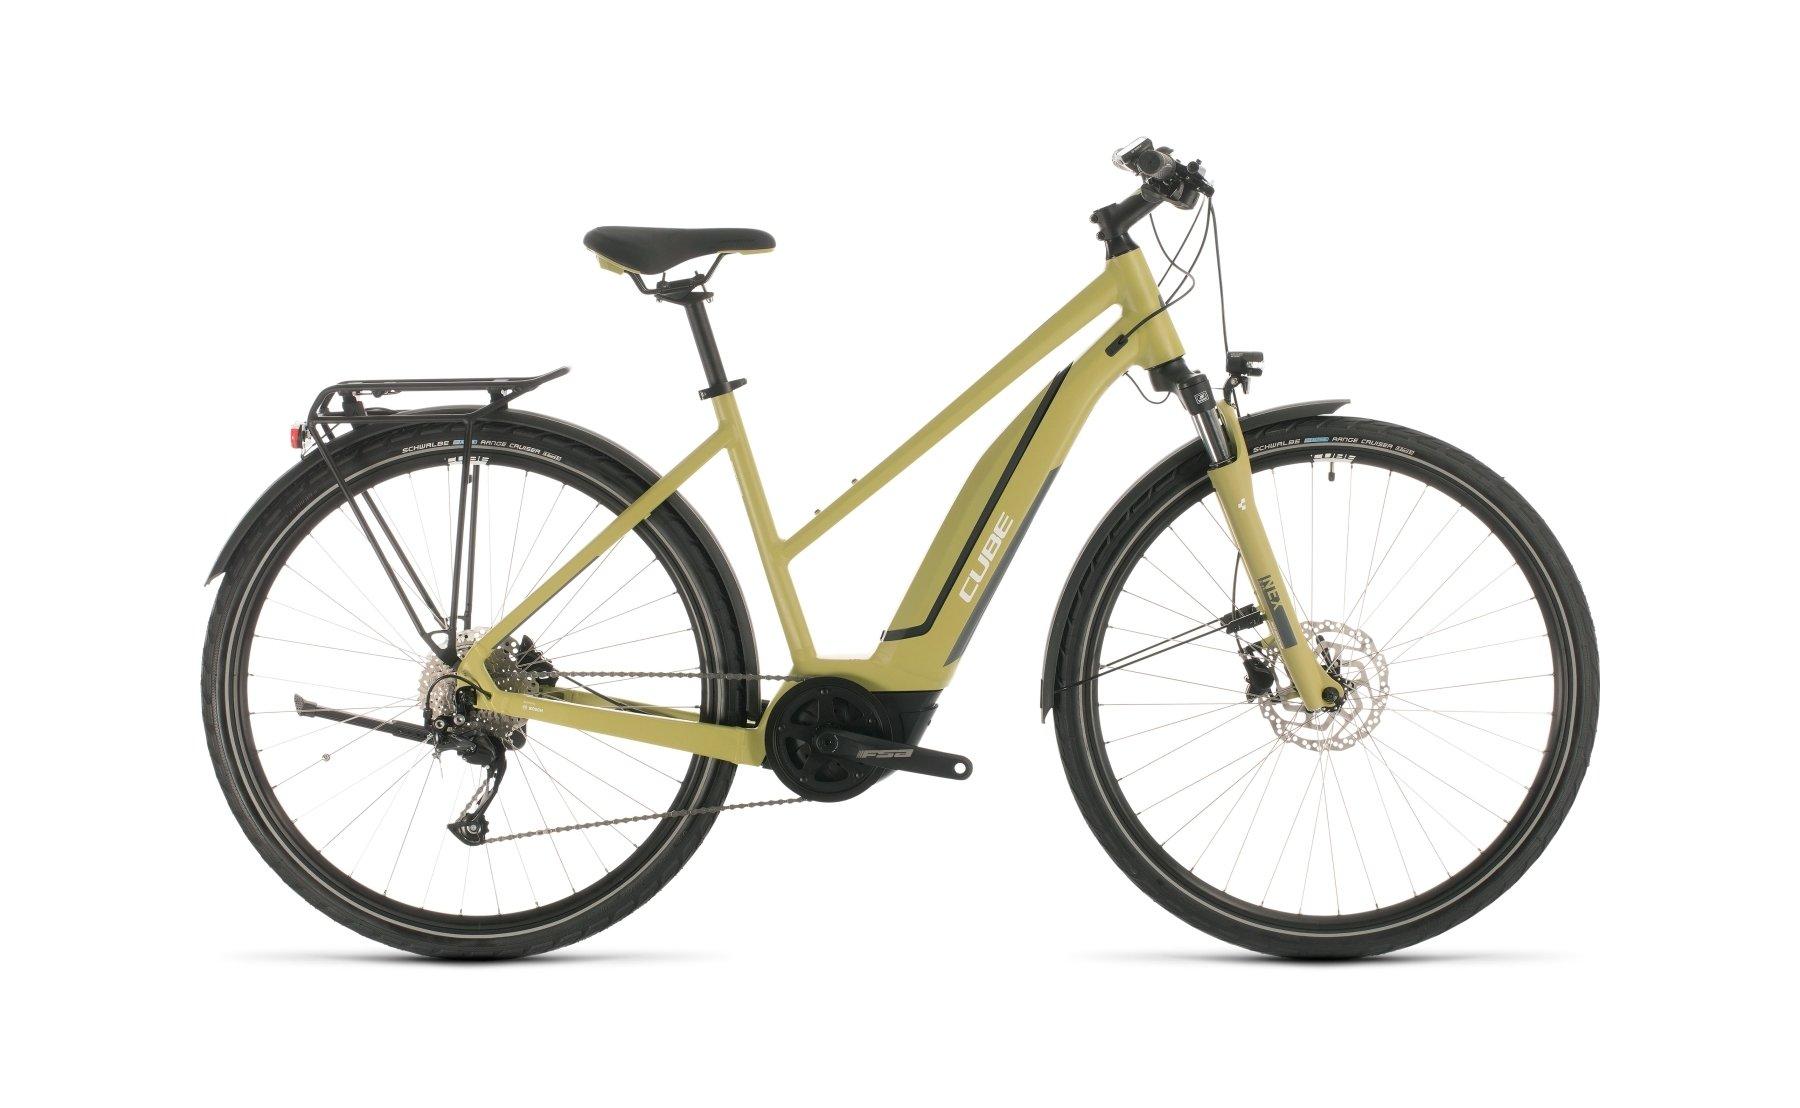 cube touring hybrid one 500 2020 28 zoll bestellen fahrrad xxl. Black Bedroom Furniture Sets. Home Design Ideas